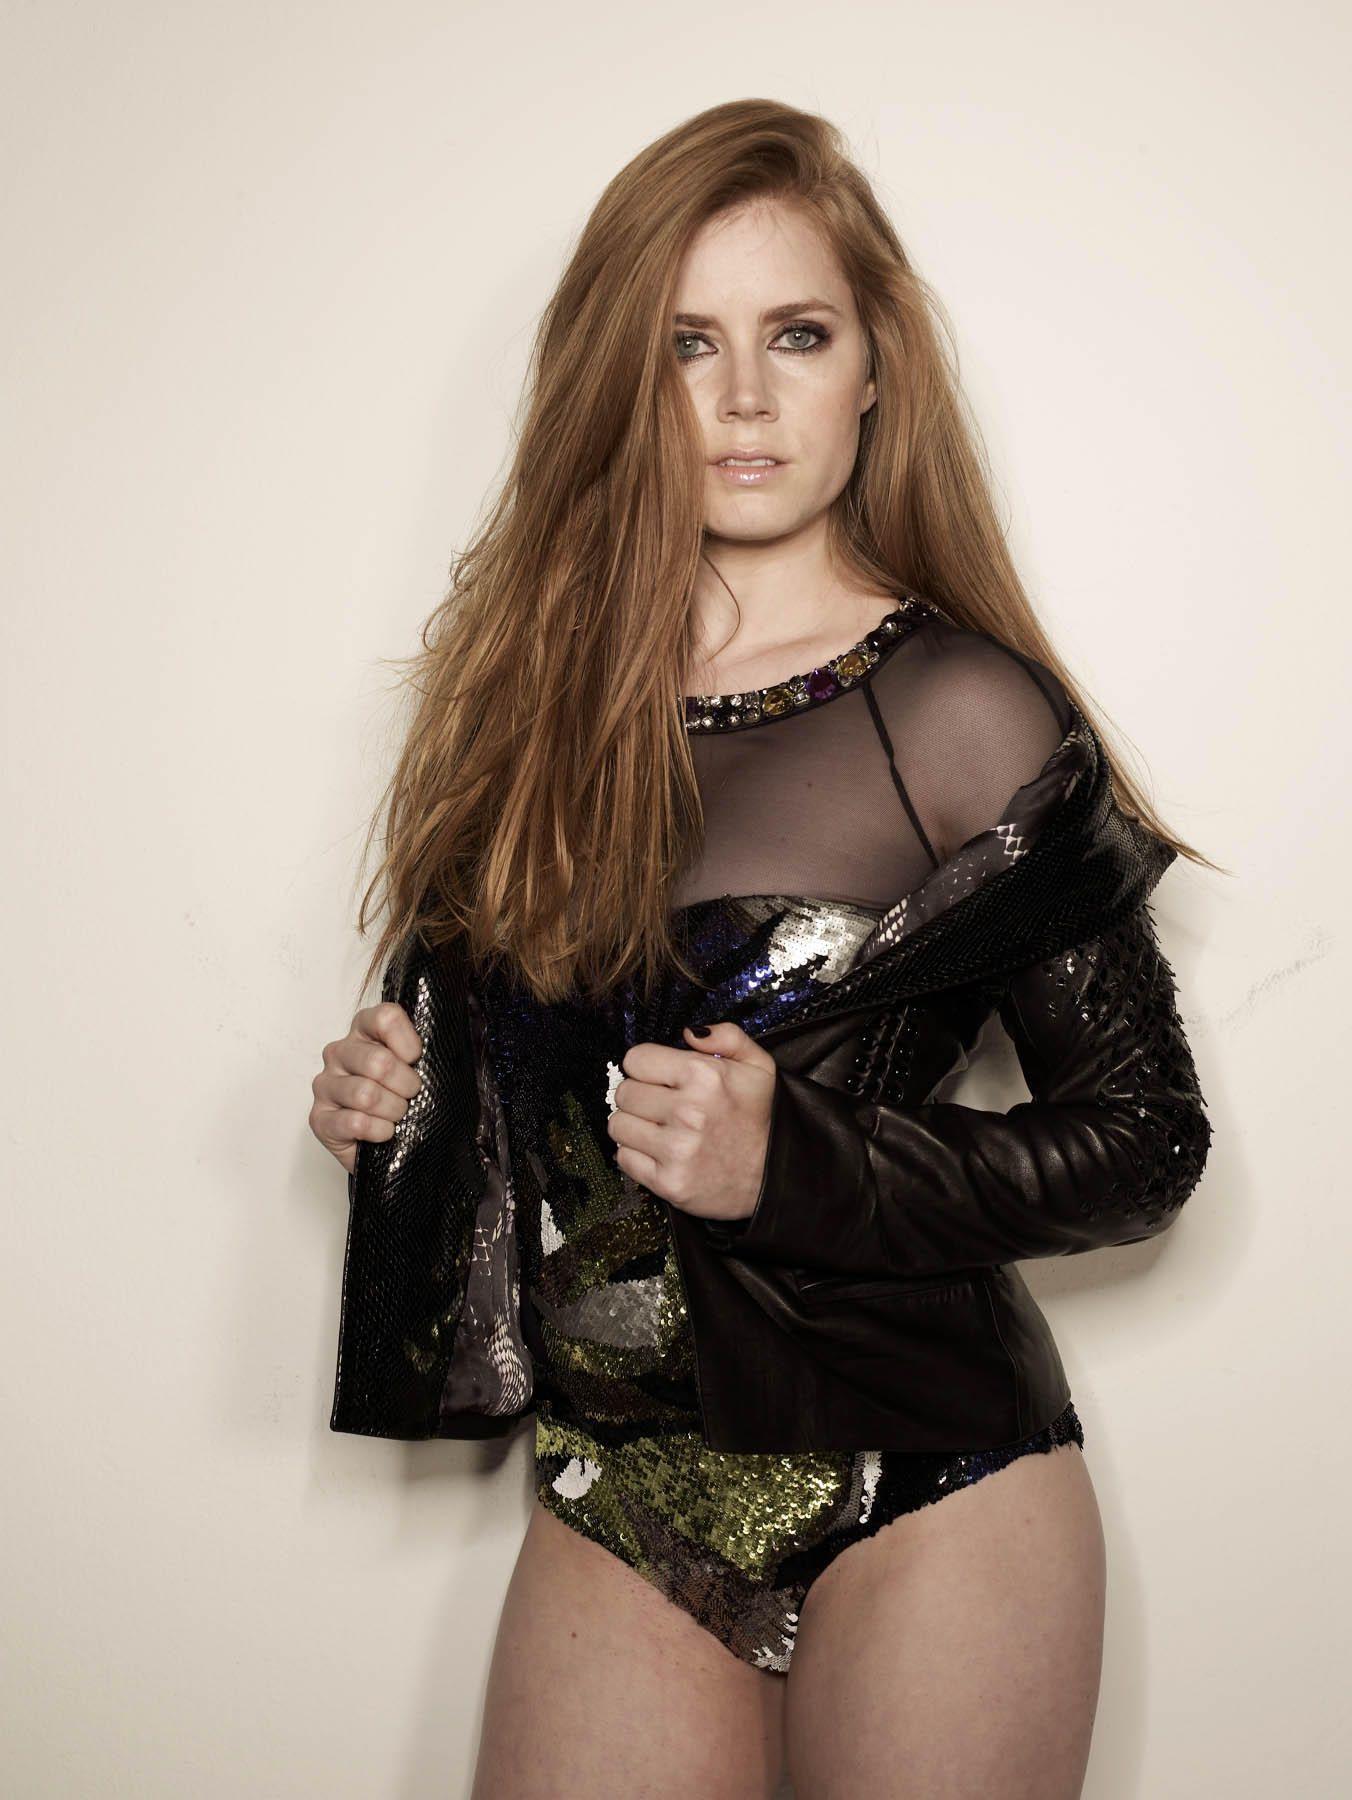 Hottest Redheads In The World 2013 Amy Adams Bikini Amy Adams